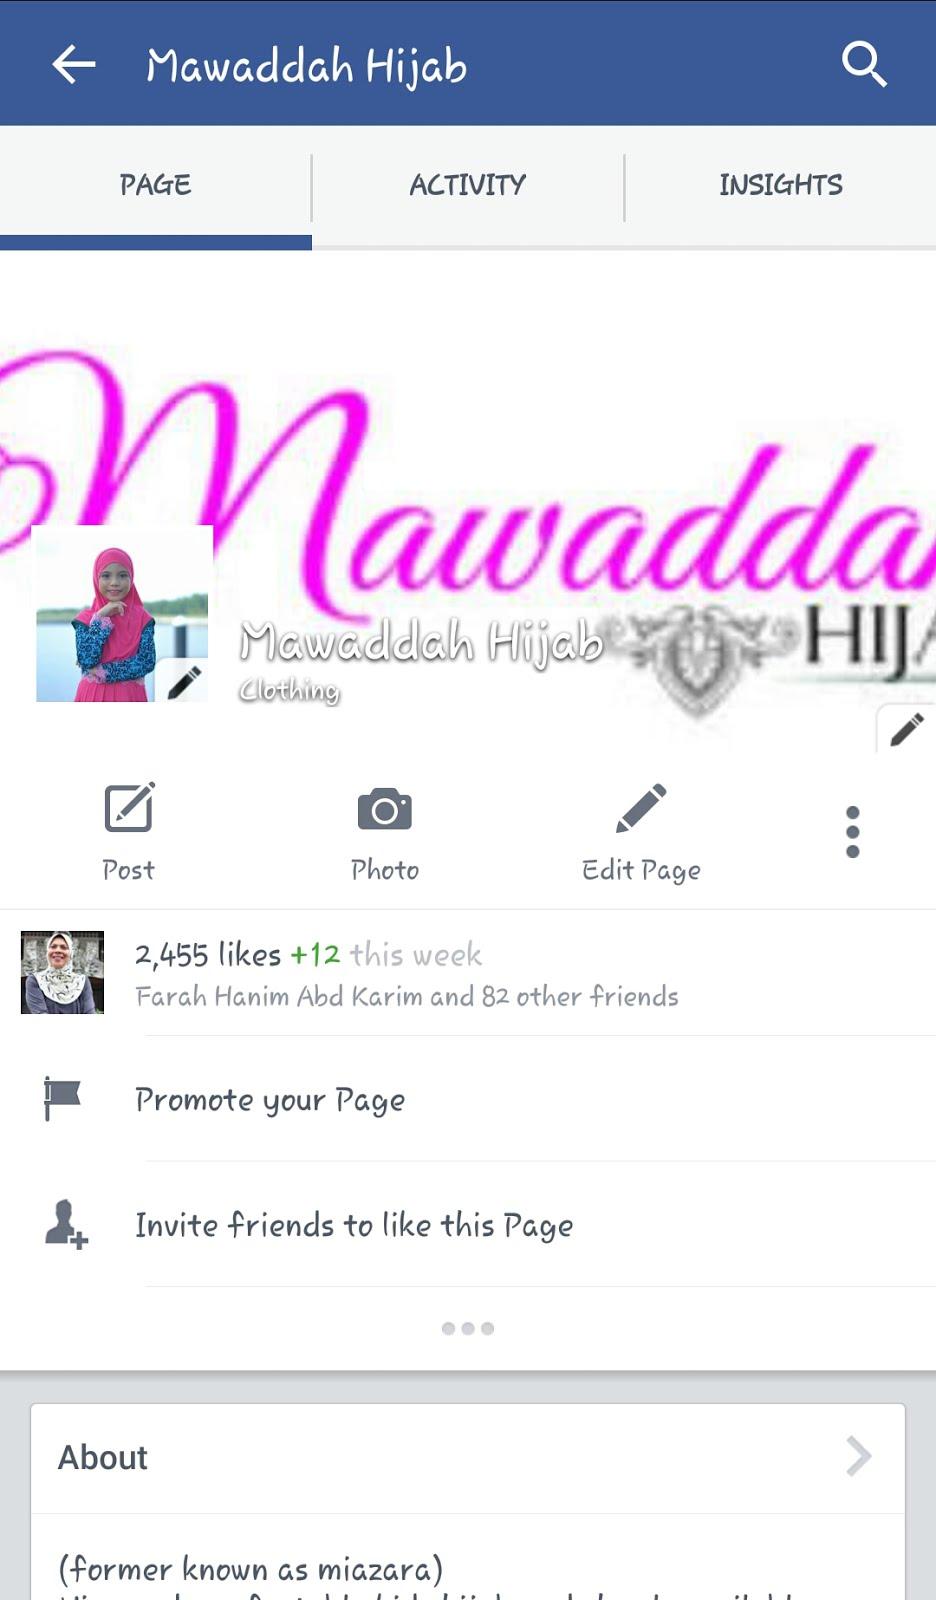 Mawaddah hijab fb